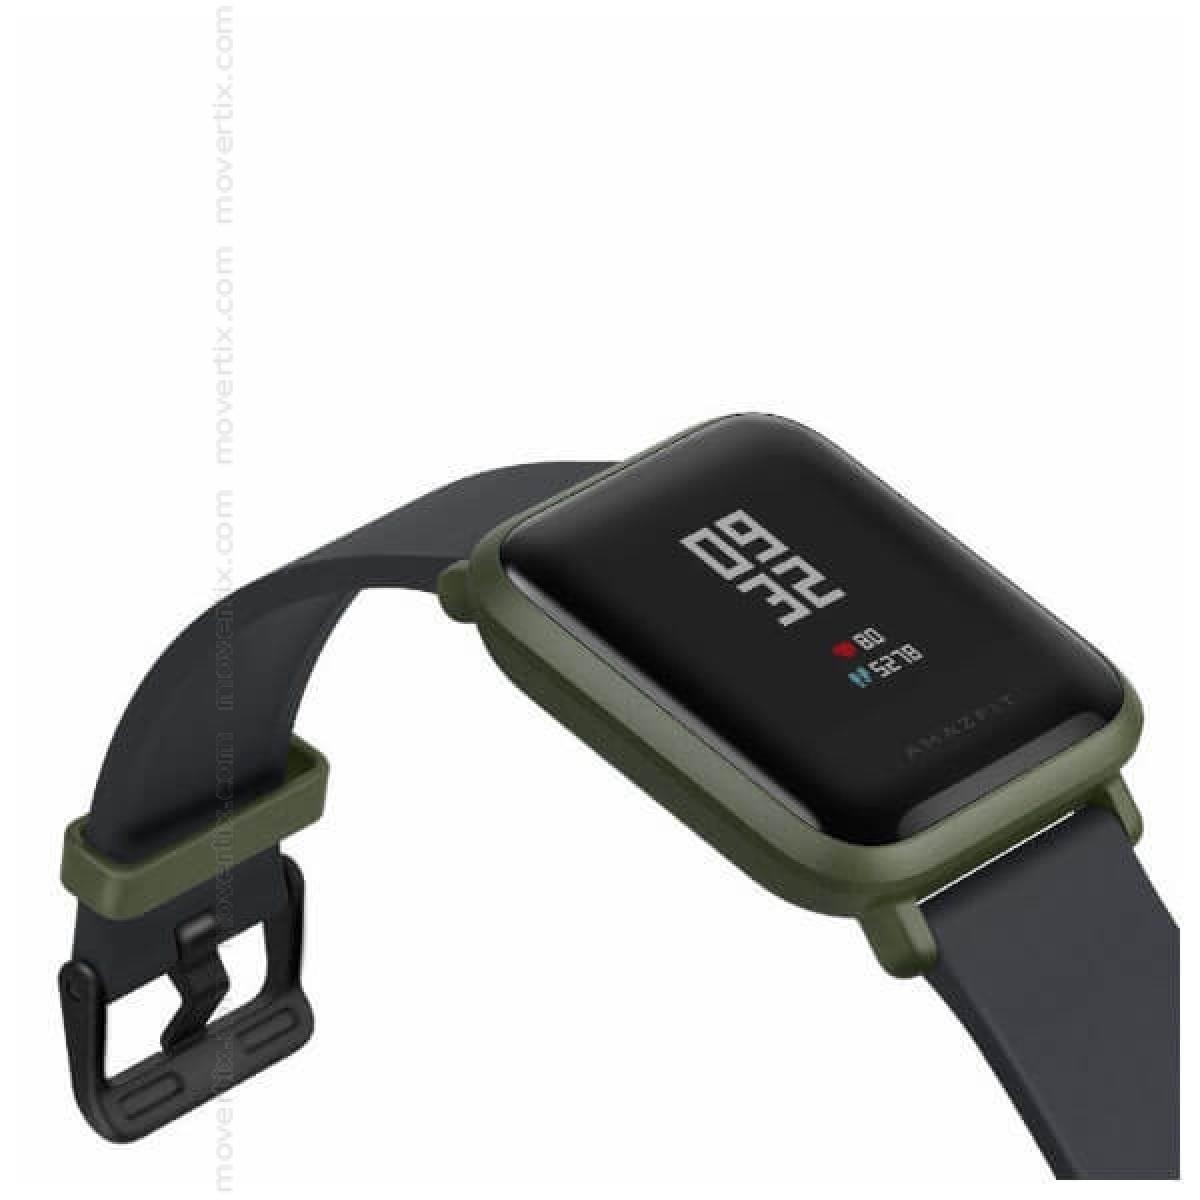 Xiaomi Huami Amazfit Bip onyx black A1608 image